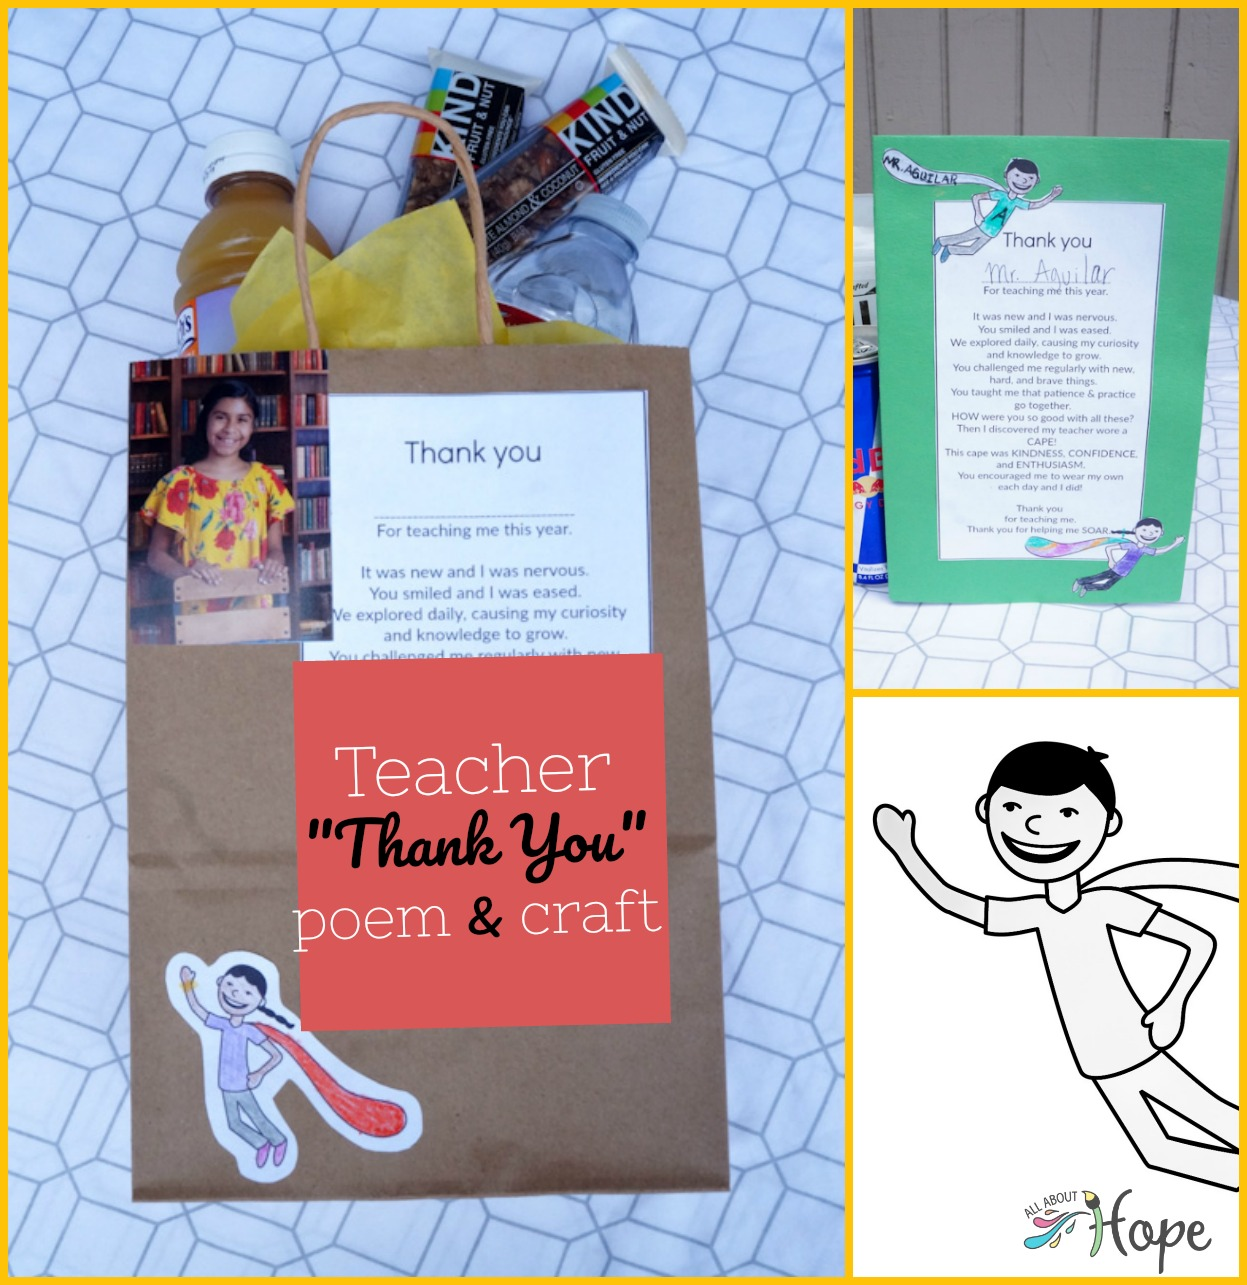 Teacher Craft, Coloring Craft, Teacher Poem, Thank You Poem, Teacher Appreciation Gift, Teacher Appreciation Week, End of Year Teacher Gift